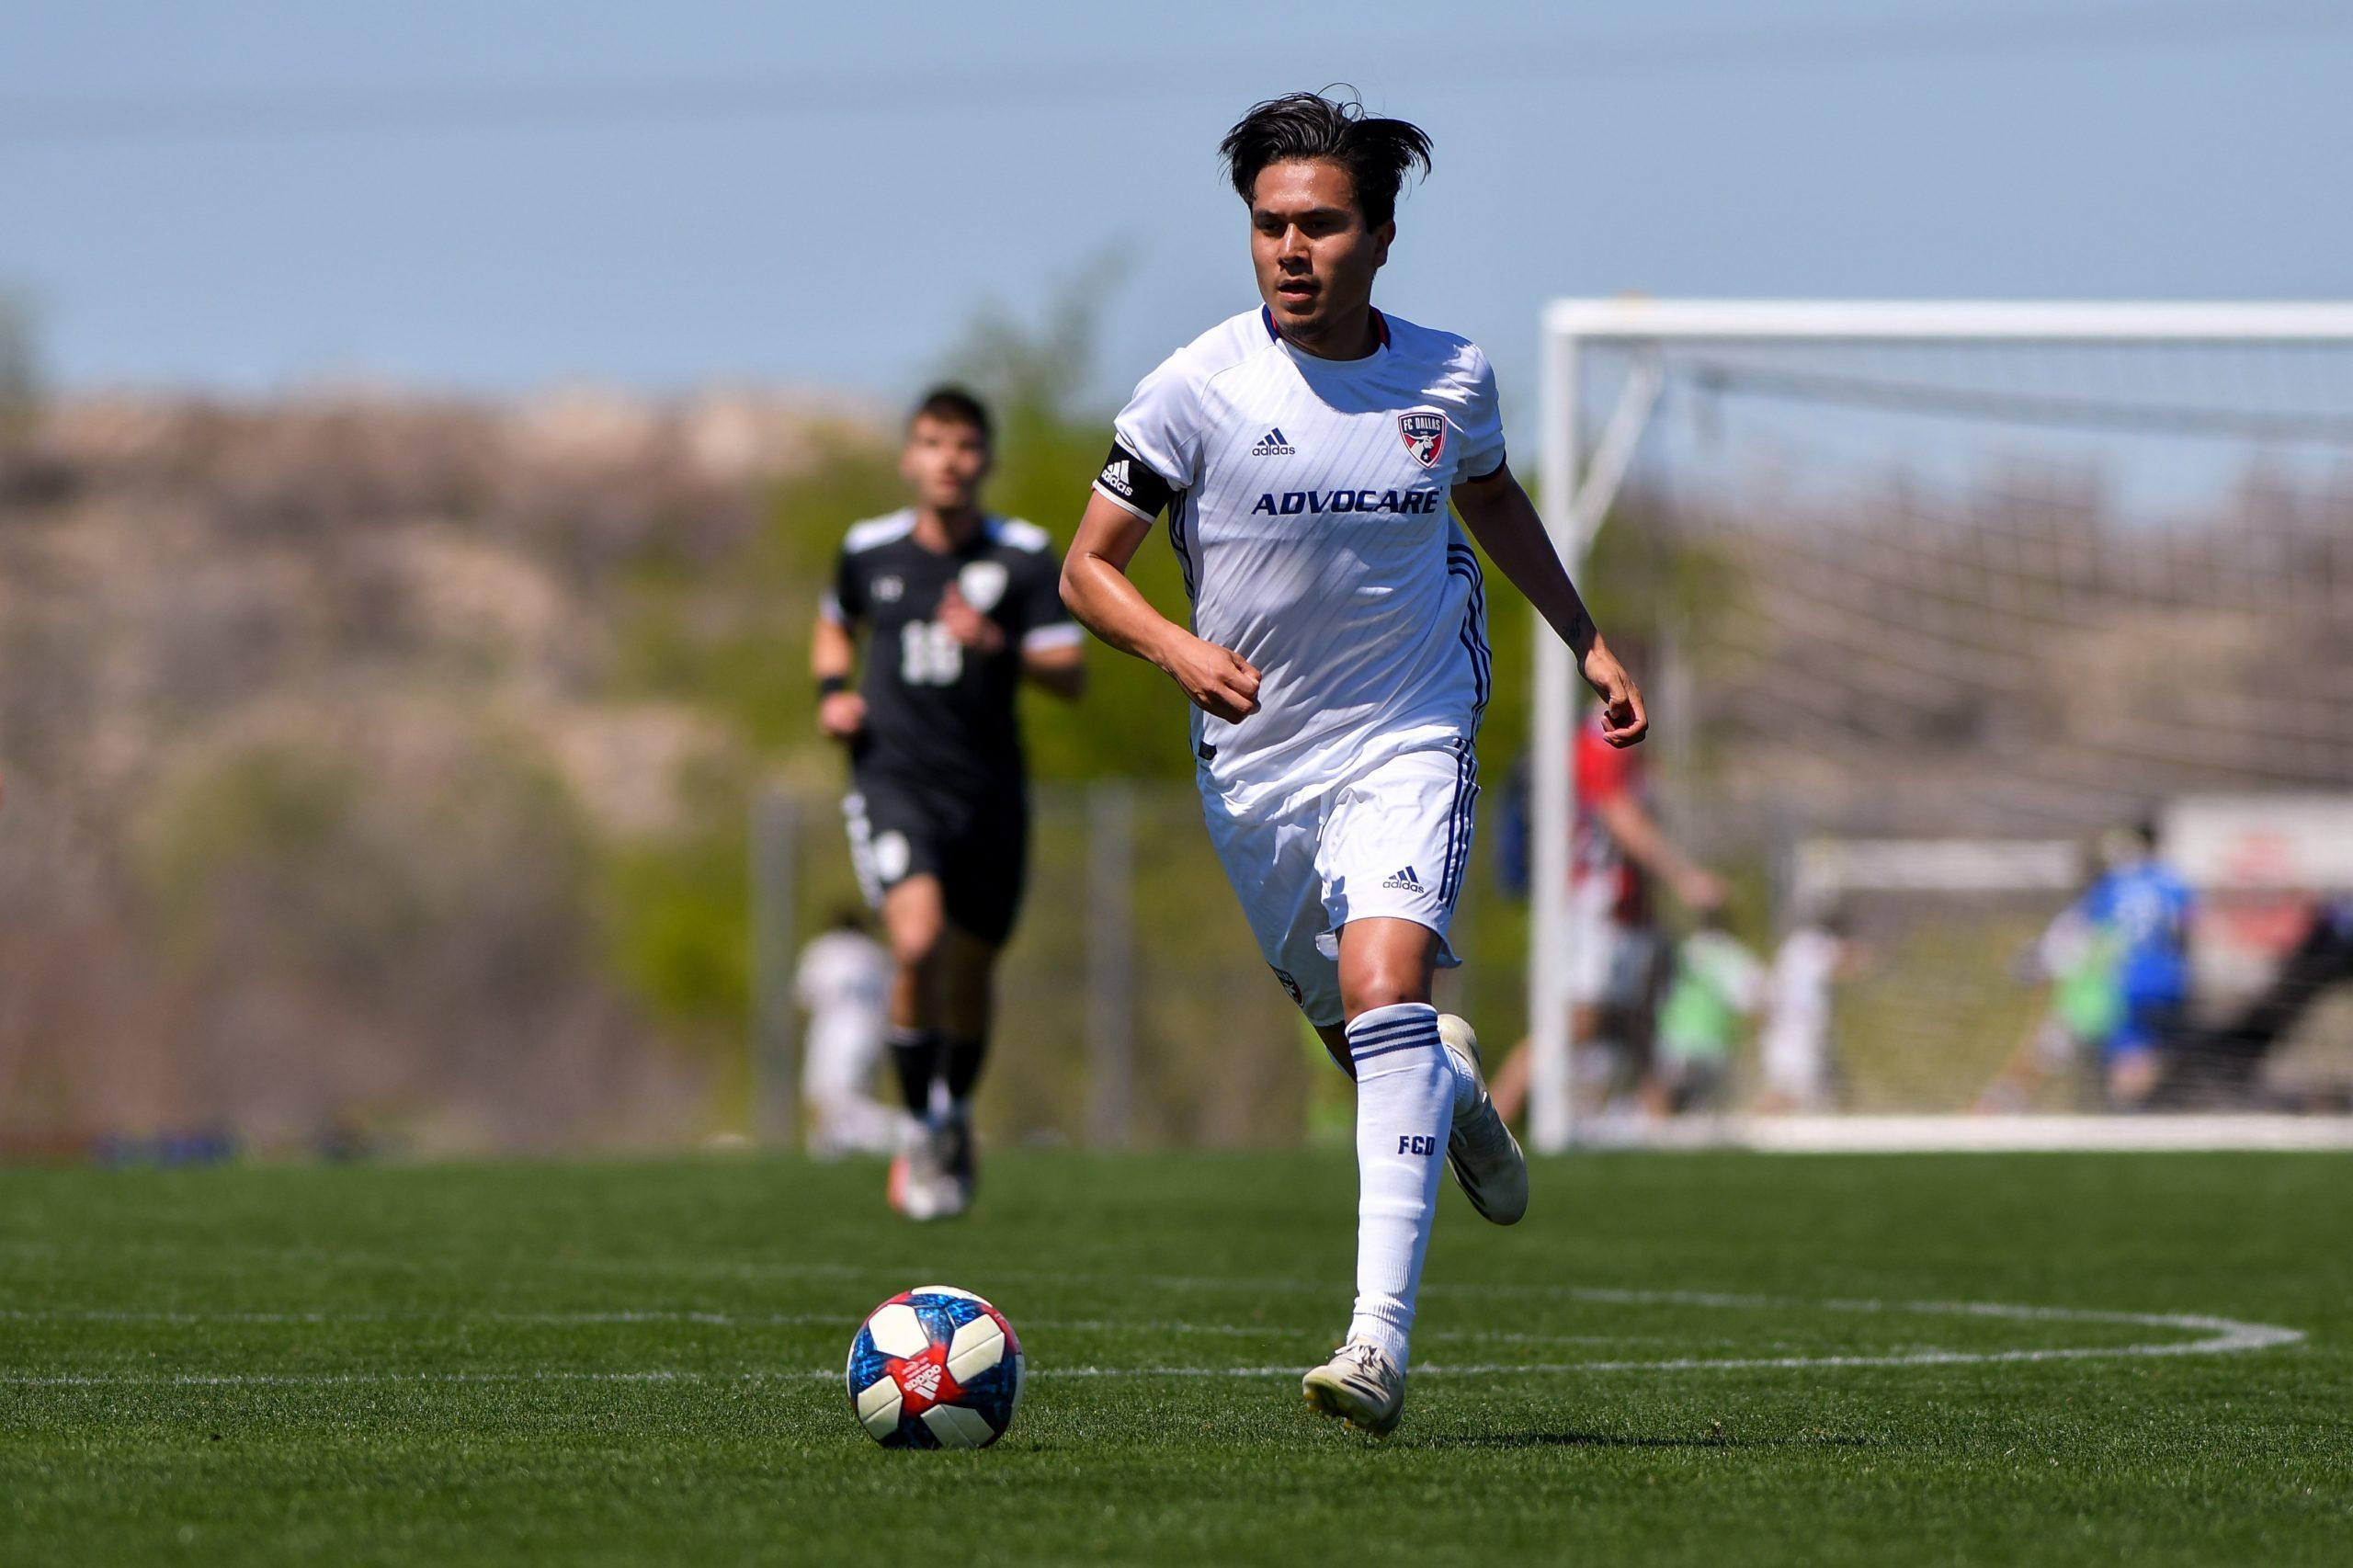 Cesar Garcia dribbles upfield in the Dallas Cup match against Black Rock FC.